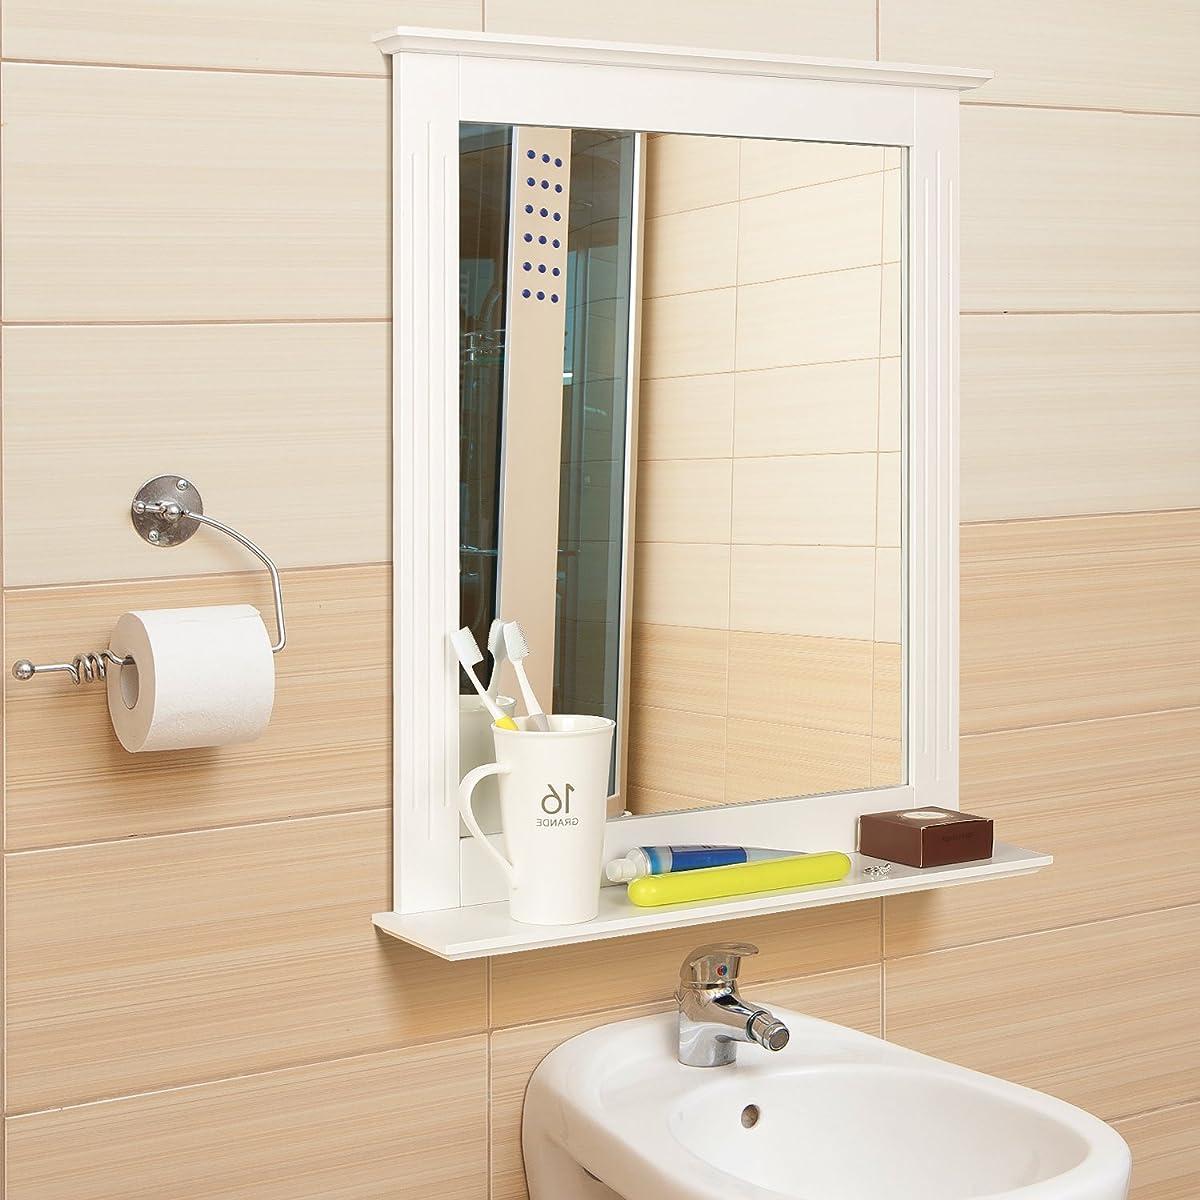 HOMFA Bathroom Wall Mirror Vanity Mirror Makeup Mirror Framed Mirror with Shelf for Home Multipurpose White